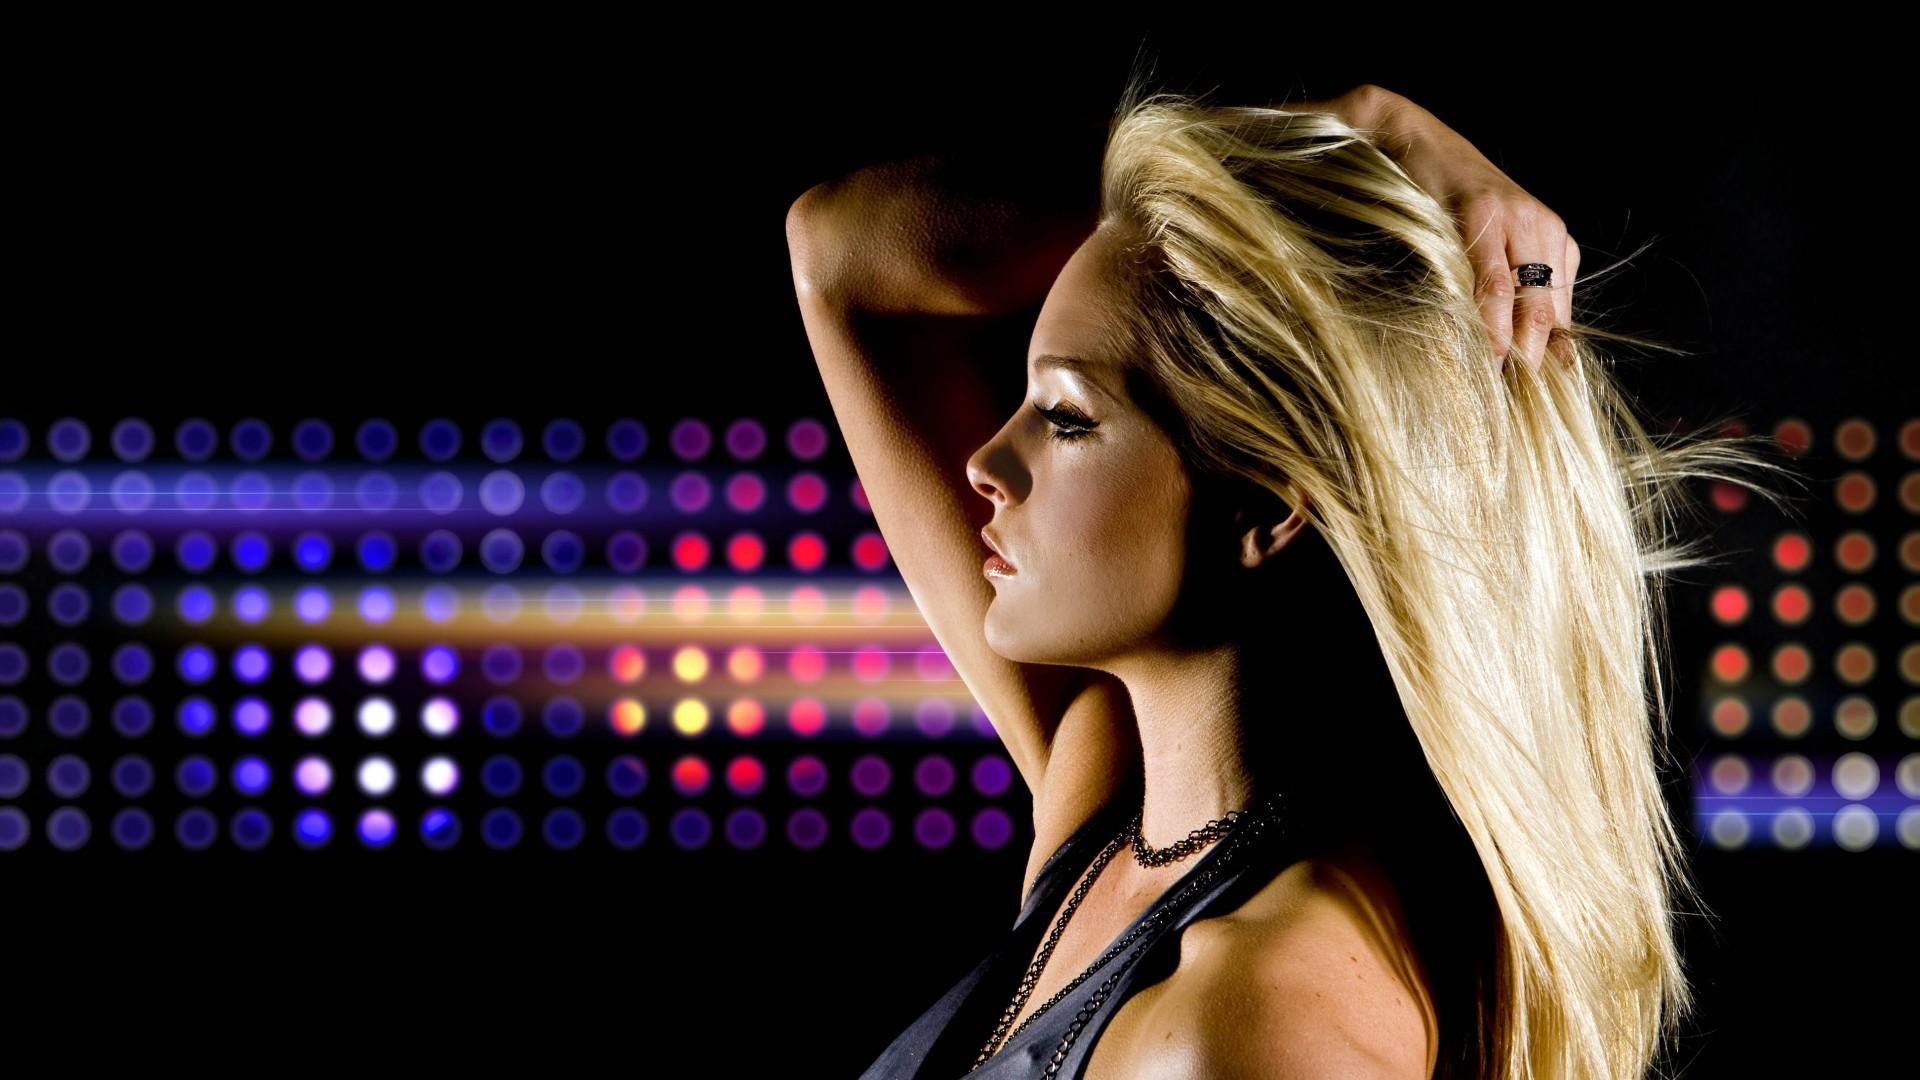 … bar · profile, girl, club